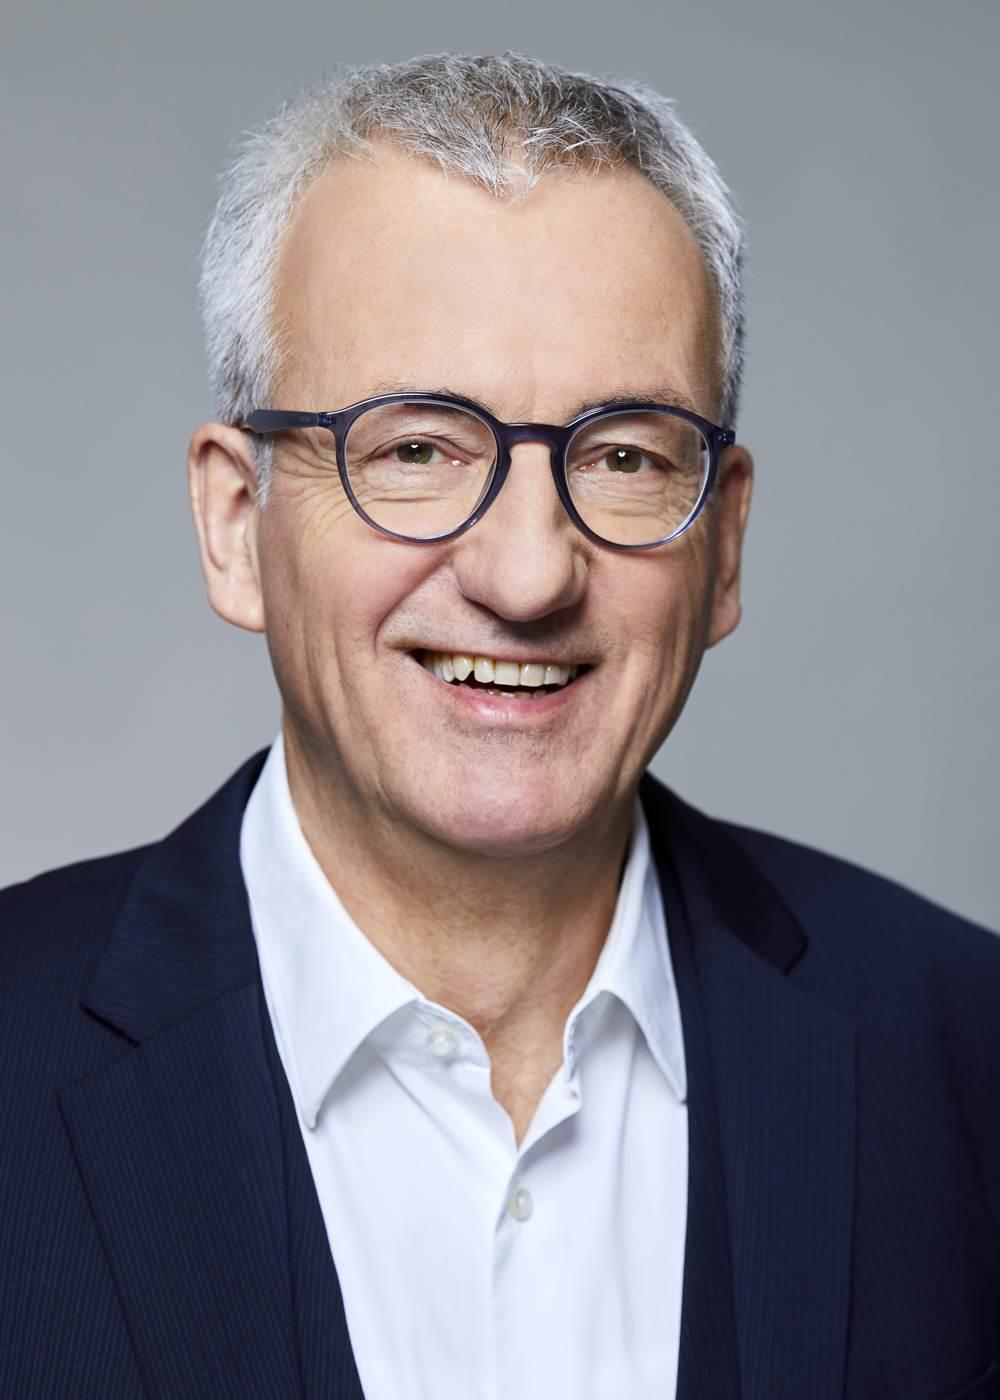 Karl-Heinz Raue